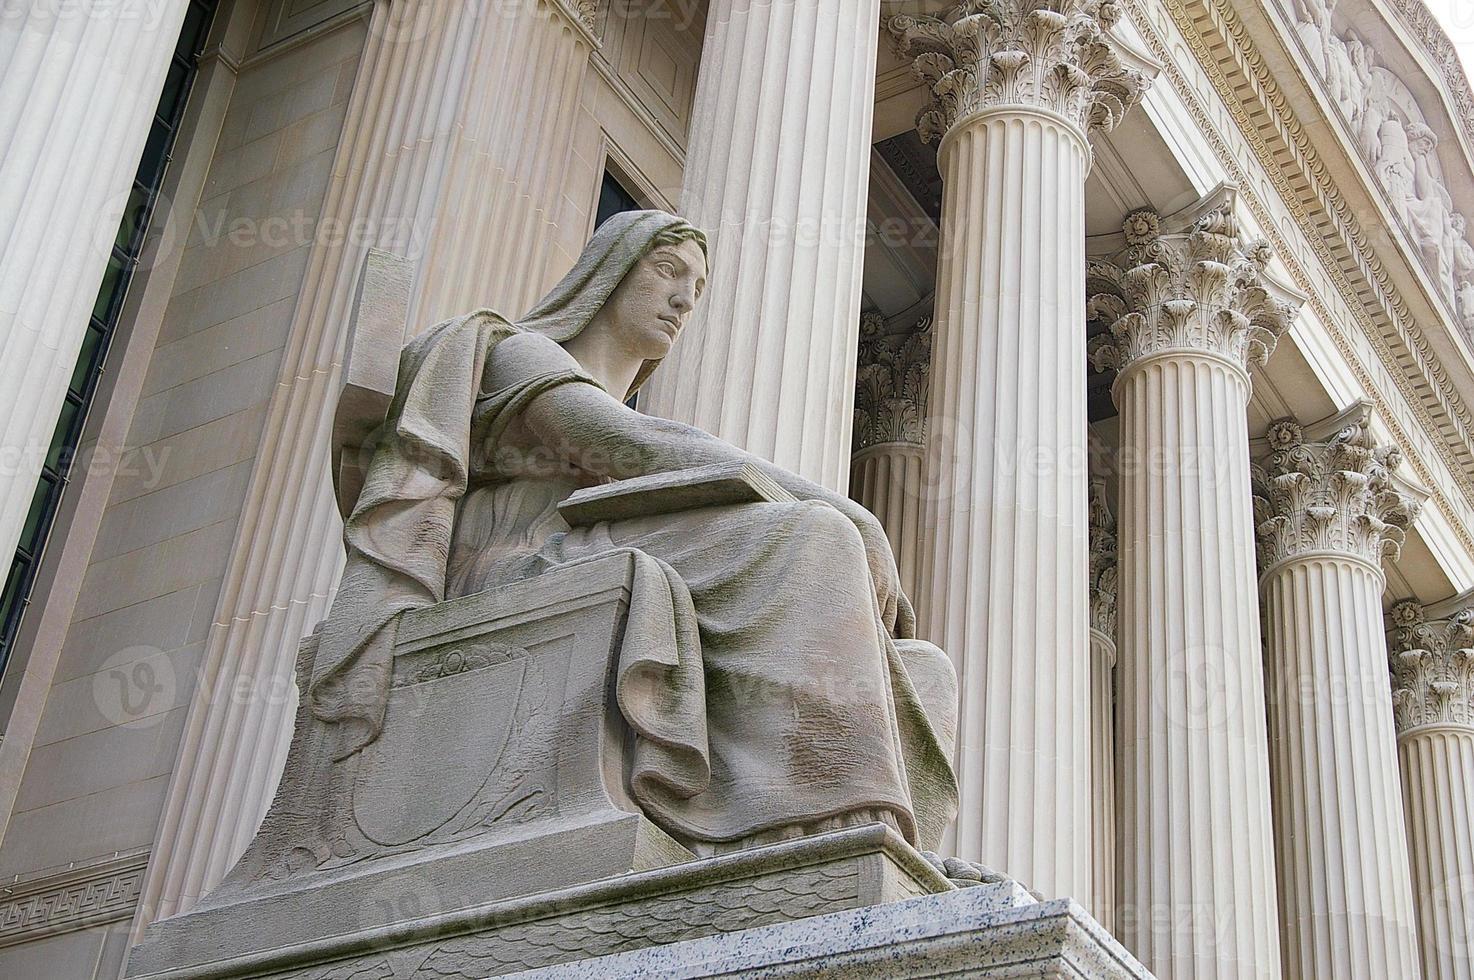 La Court Suprême photo